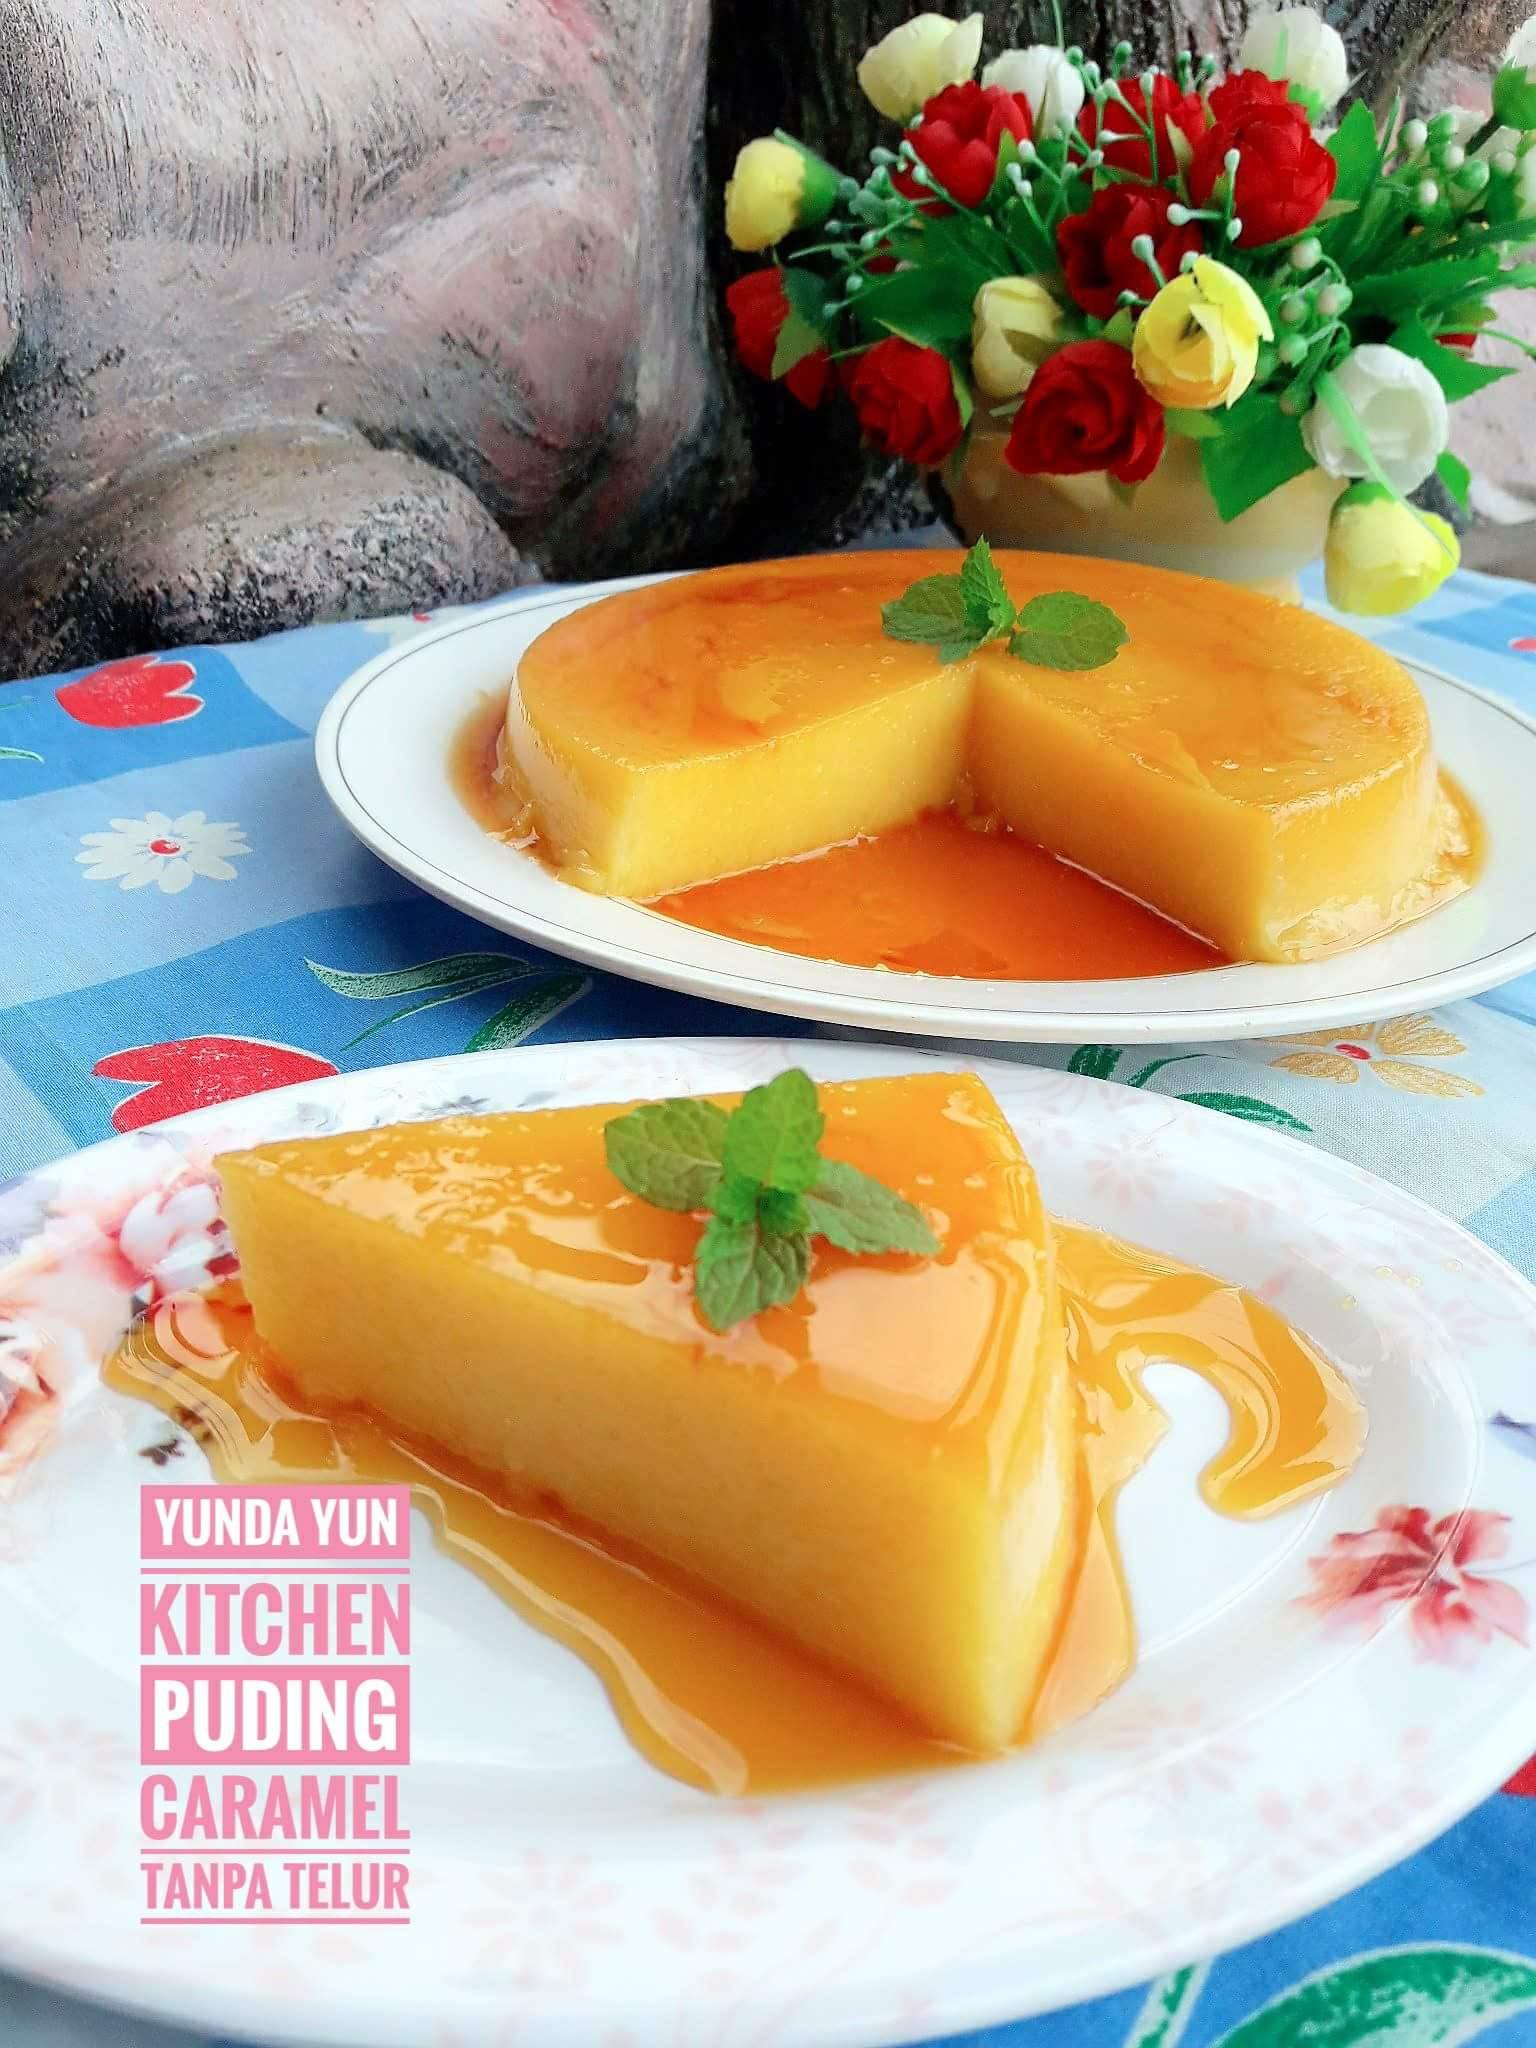 Puding Caramel Tanpa Telur Yunda Yun Kitchen Langsungenak Com